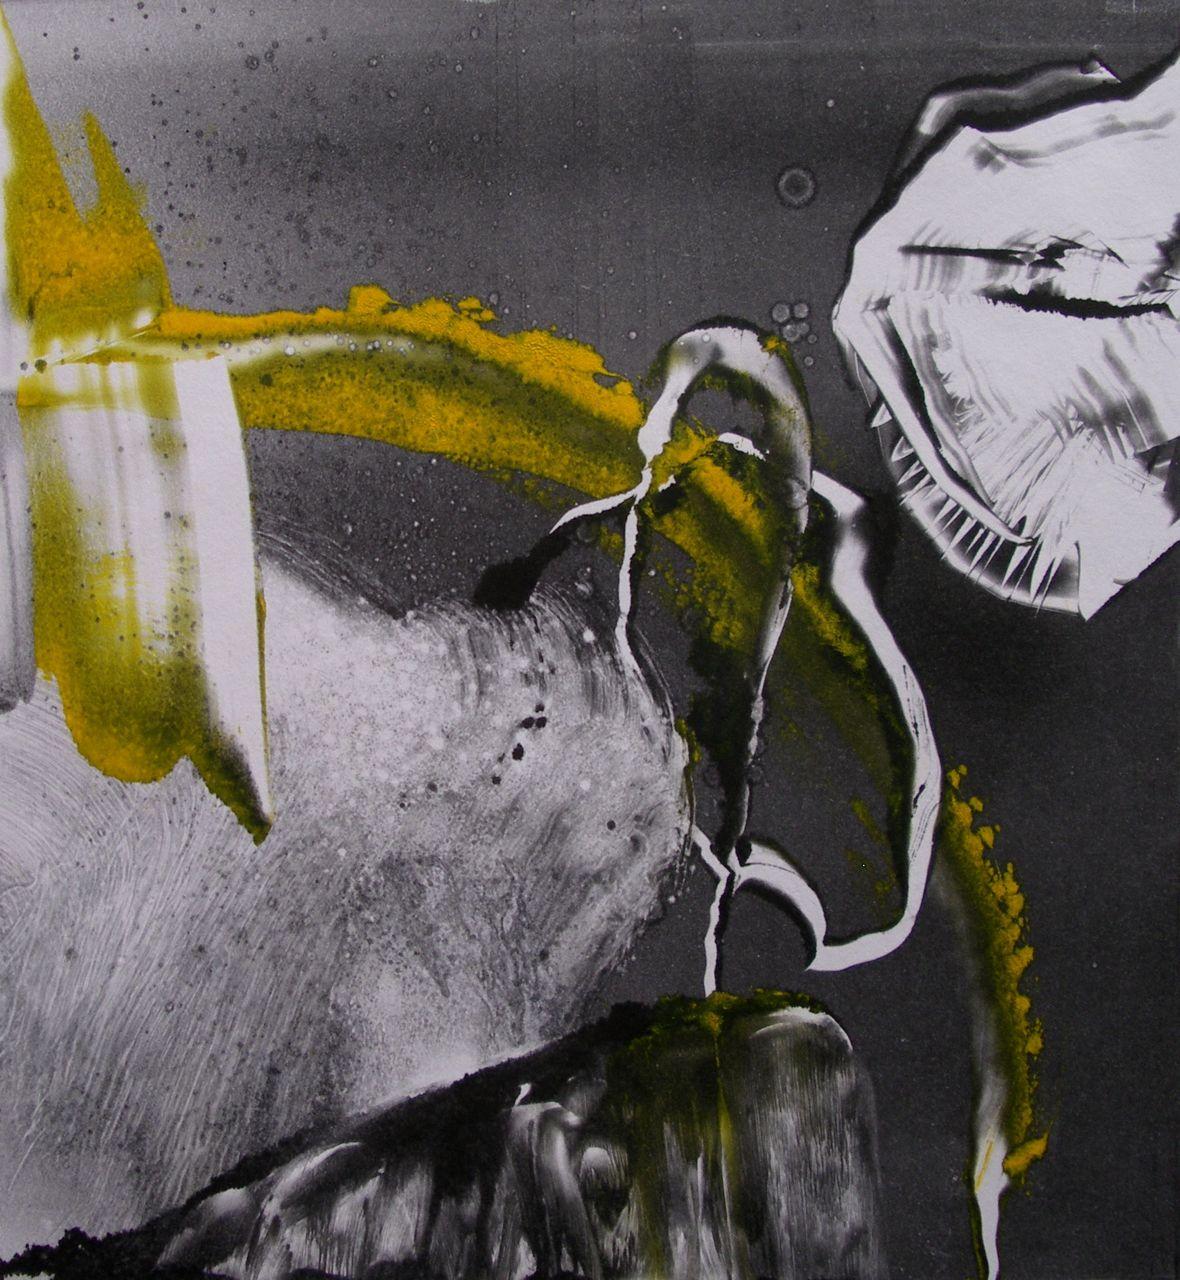 monoprint [21x20cm] Laura Hudson 2014